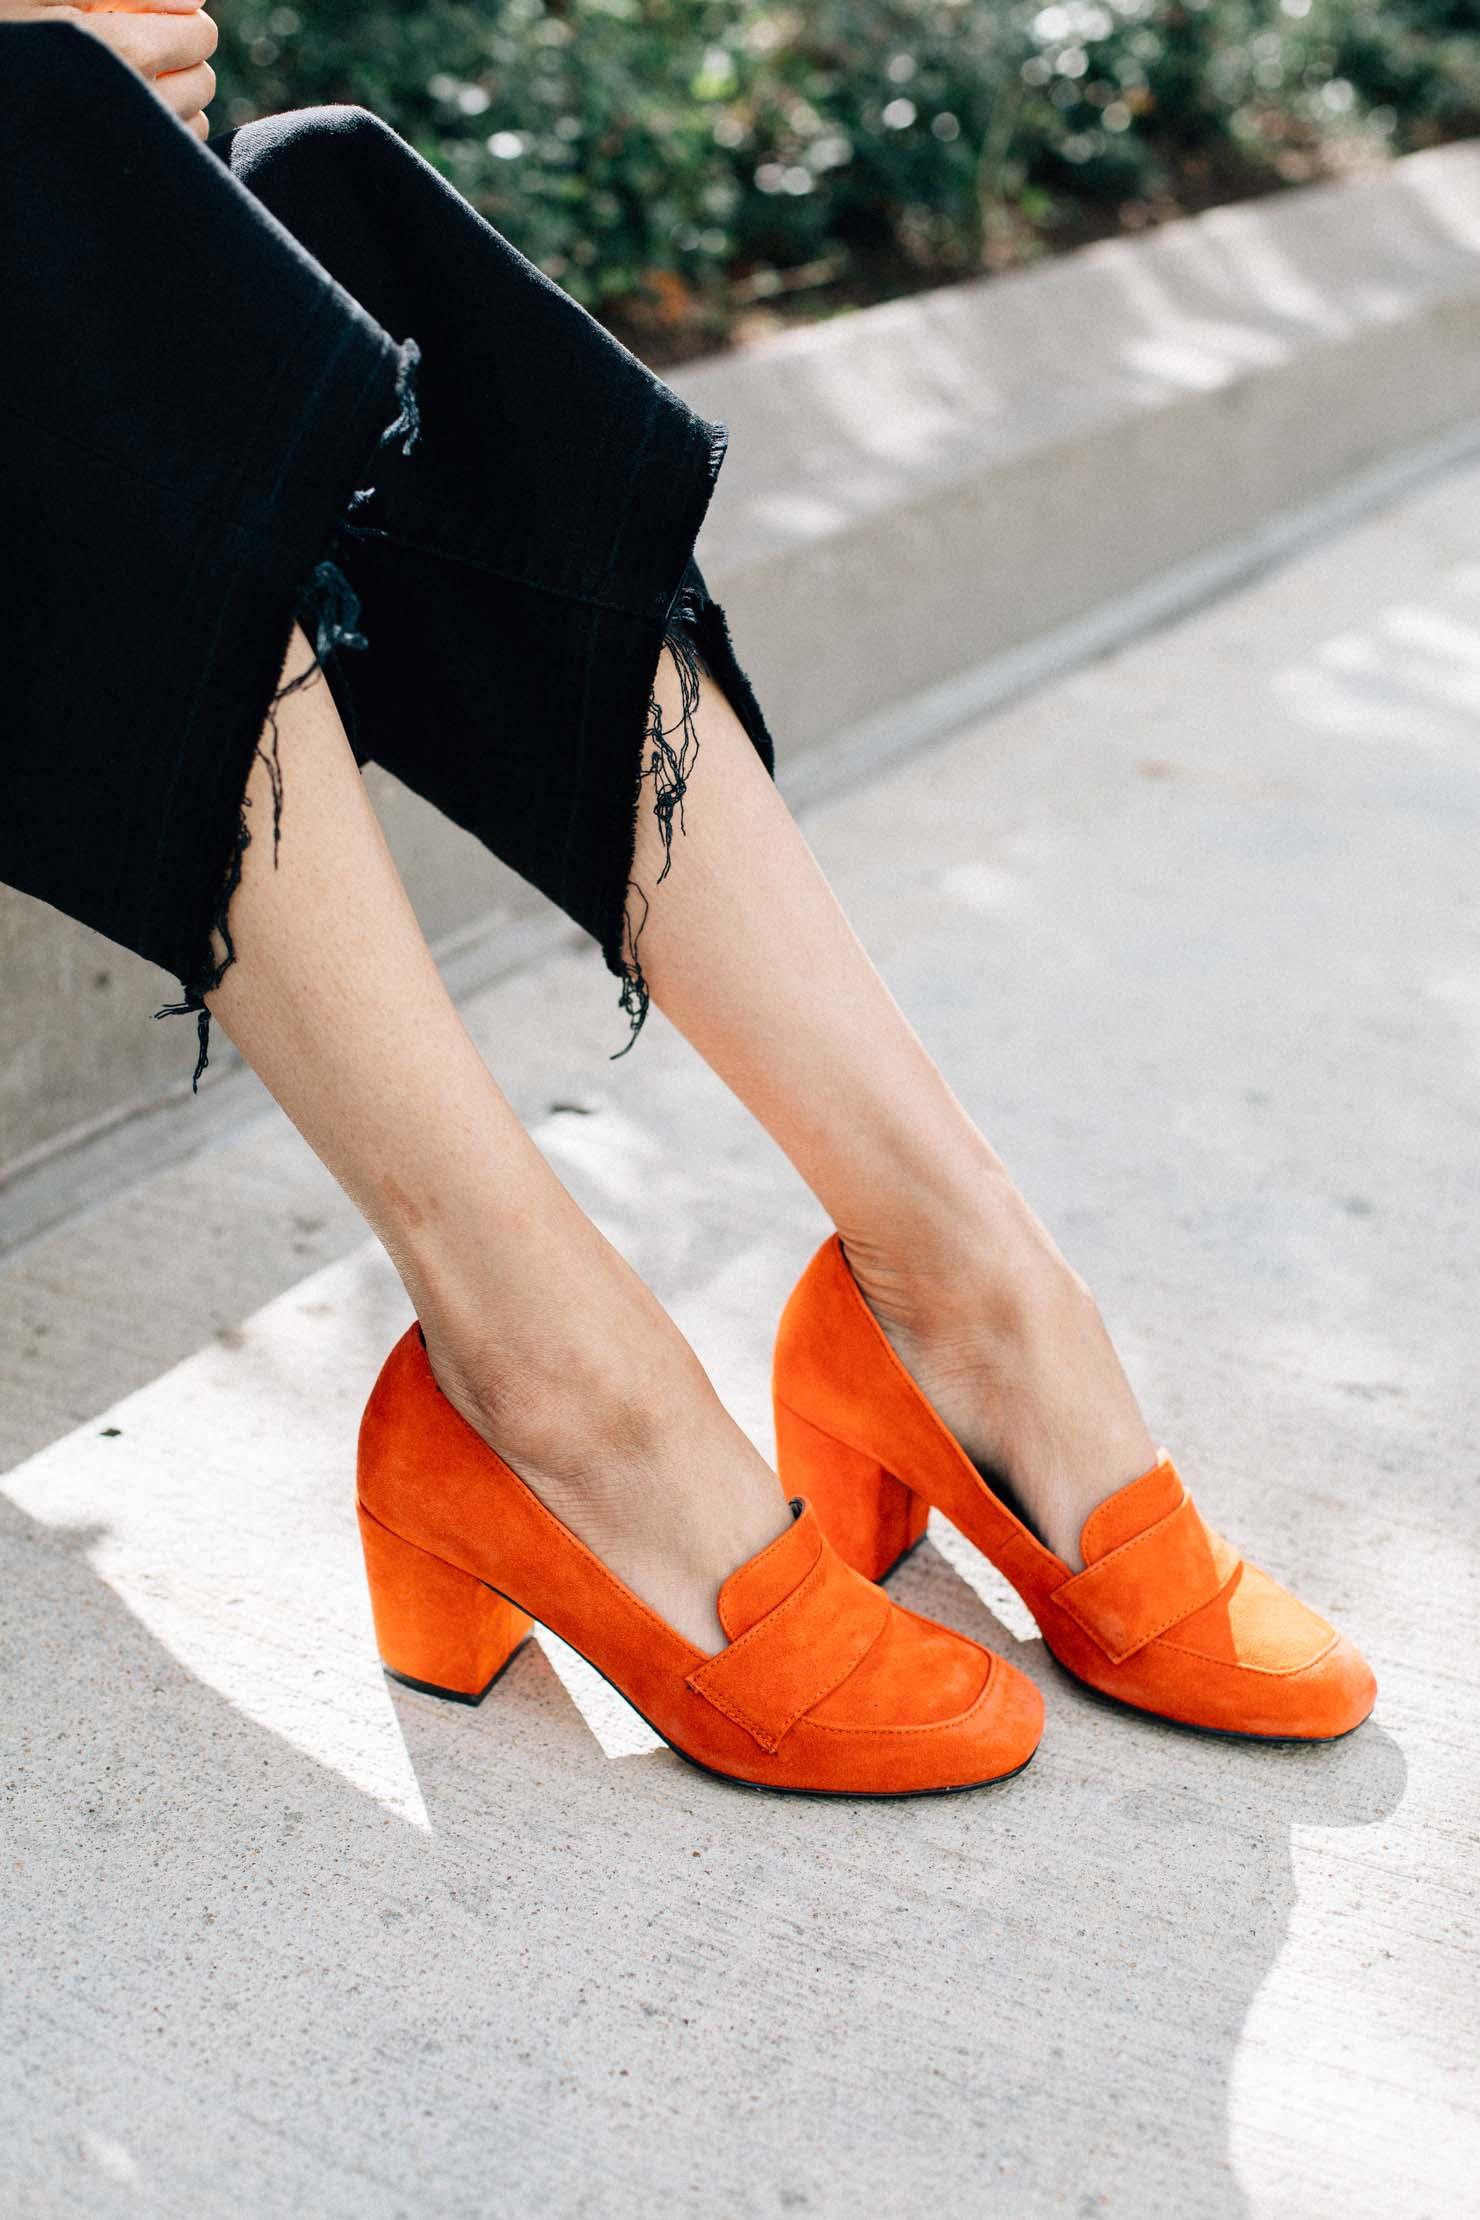 Style blogger Lilly Beltran wearing red block heel pumps and black raw hem denim